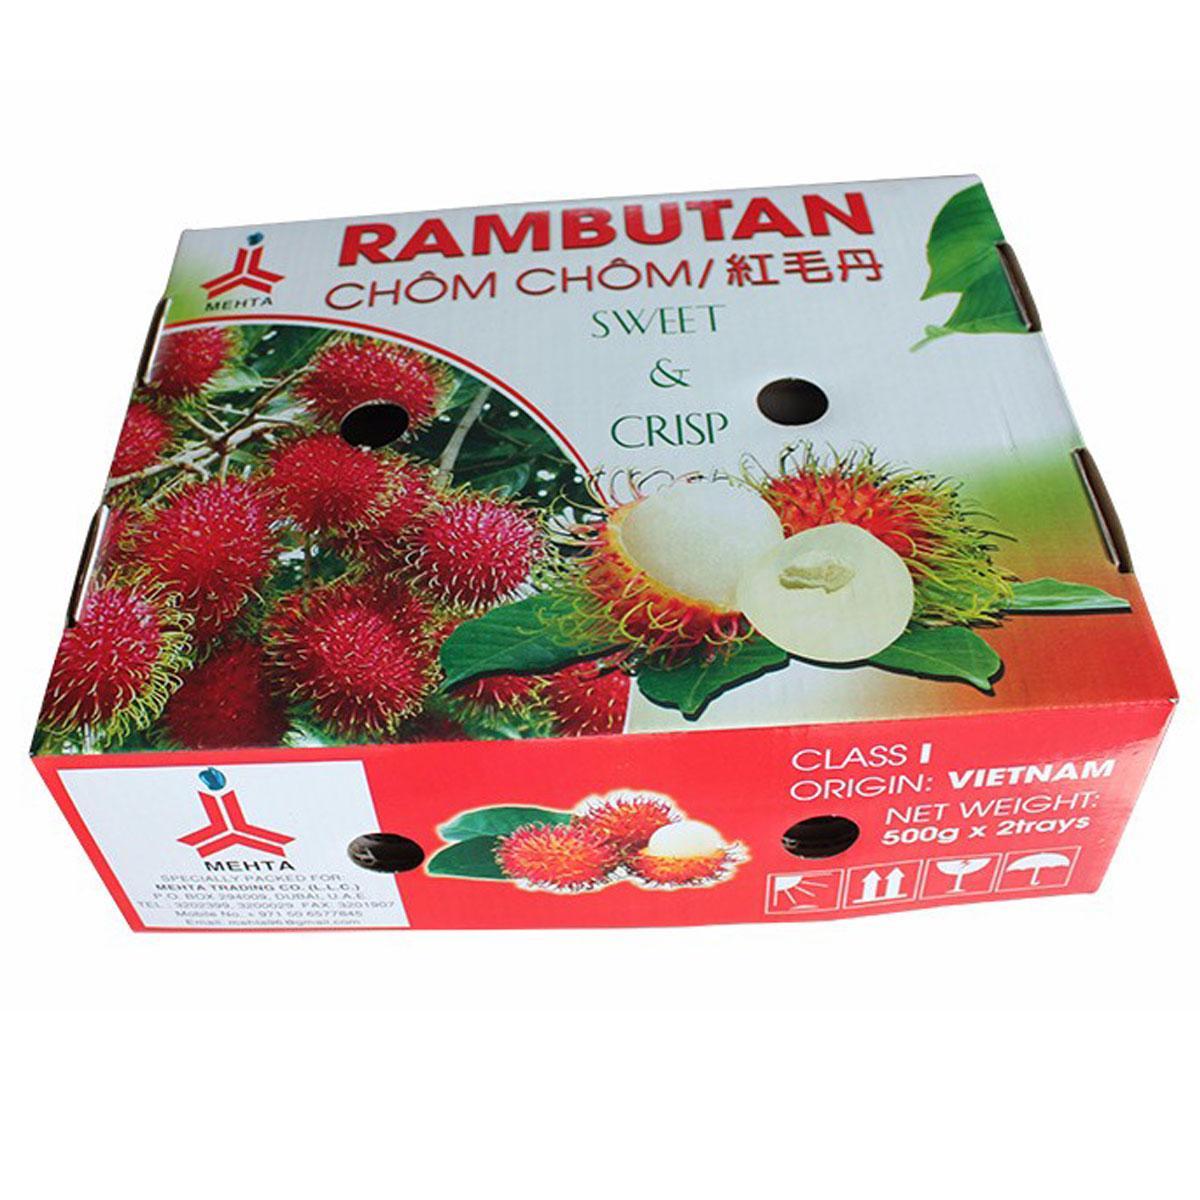 Rambutan Thailand - Box